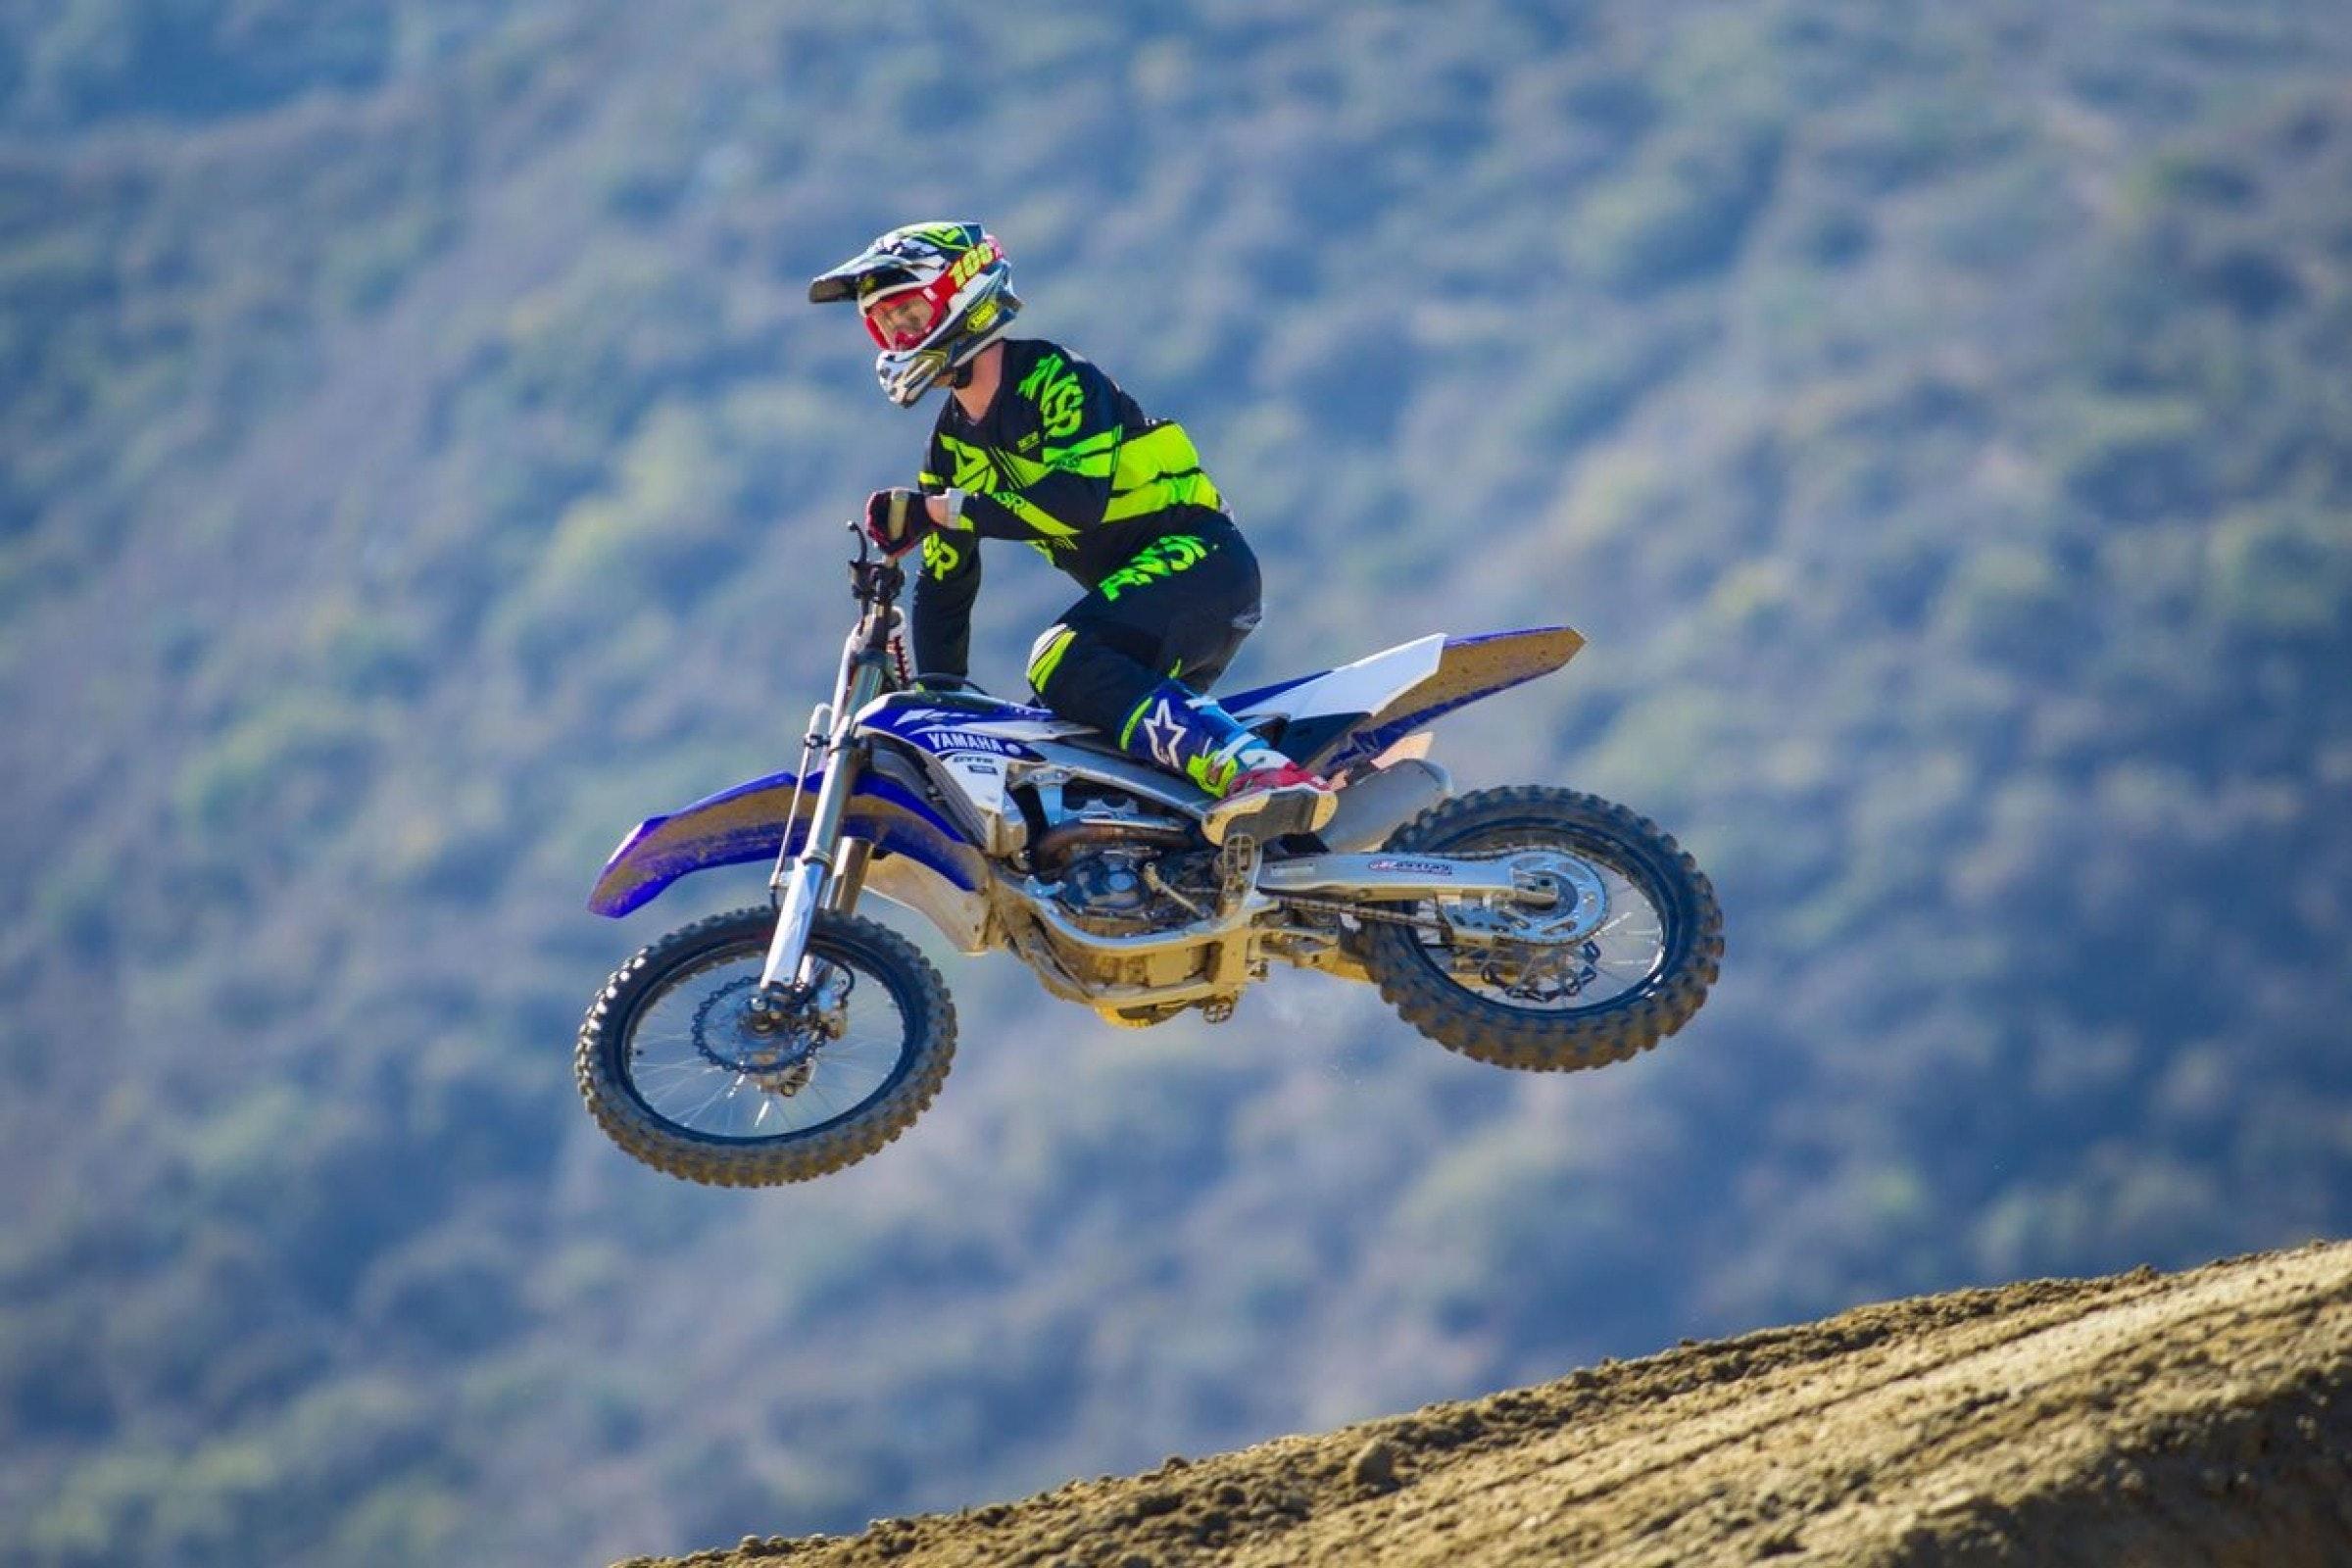 Will Dean Wilson Race Anaheim 1?